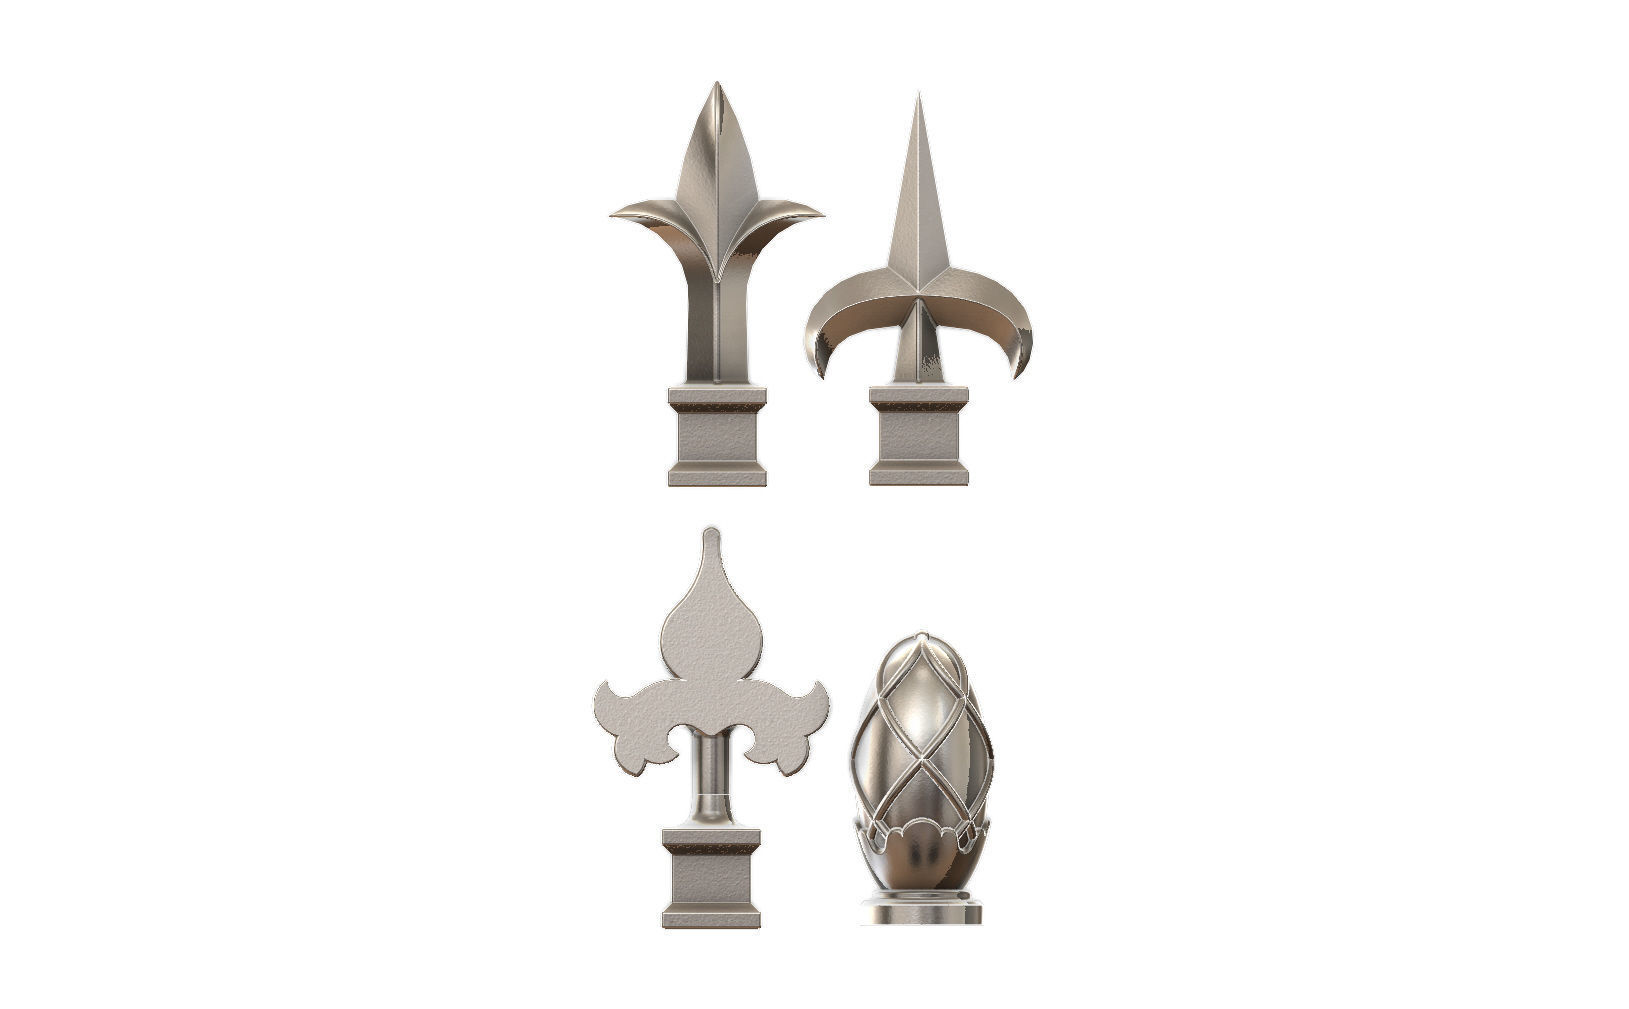 Cast iron spears designs